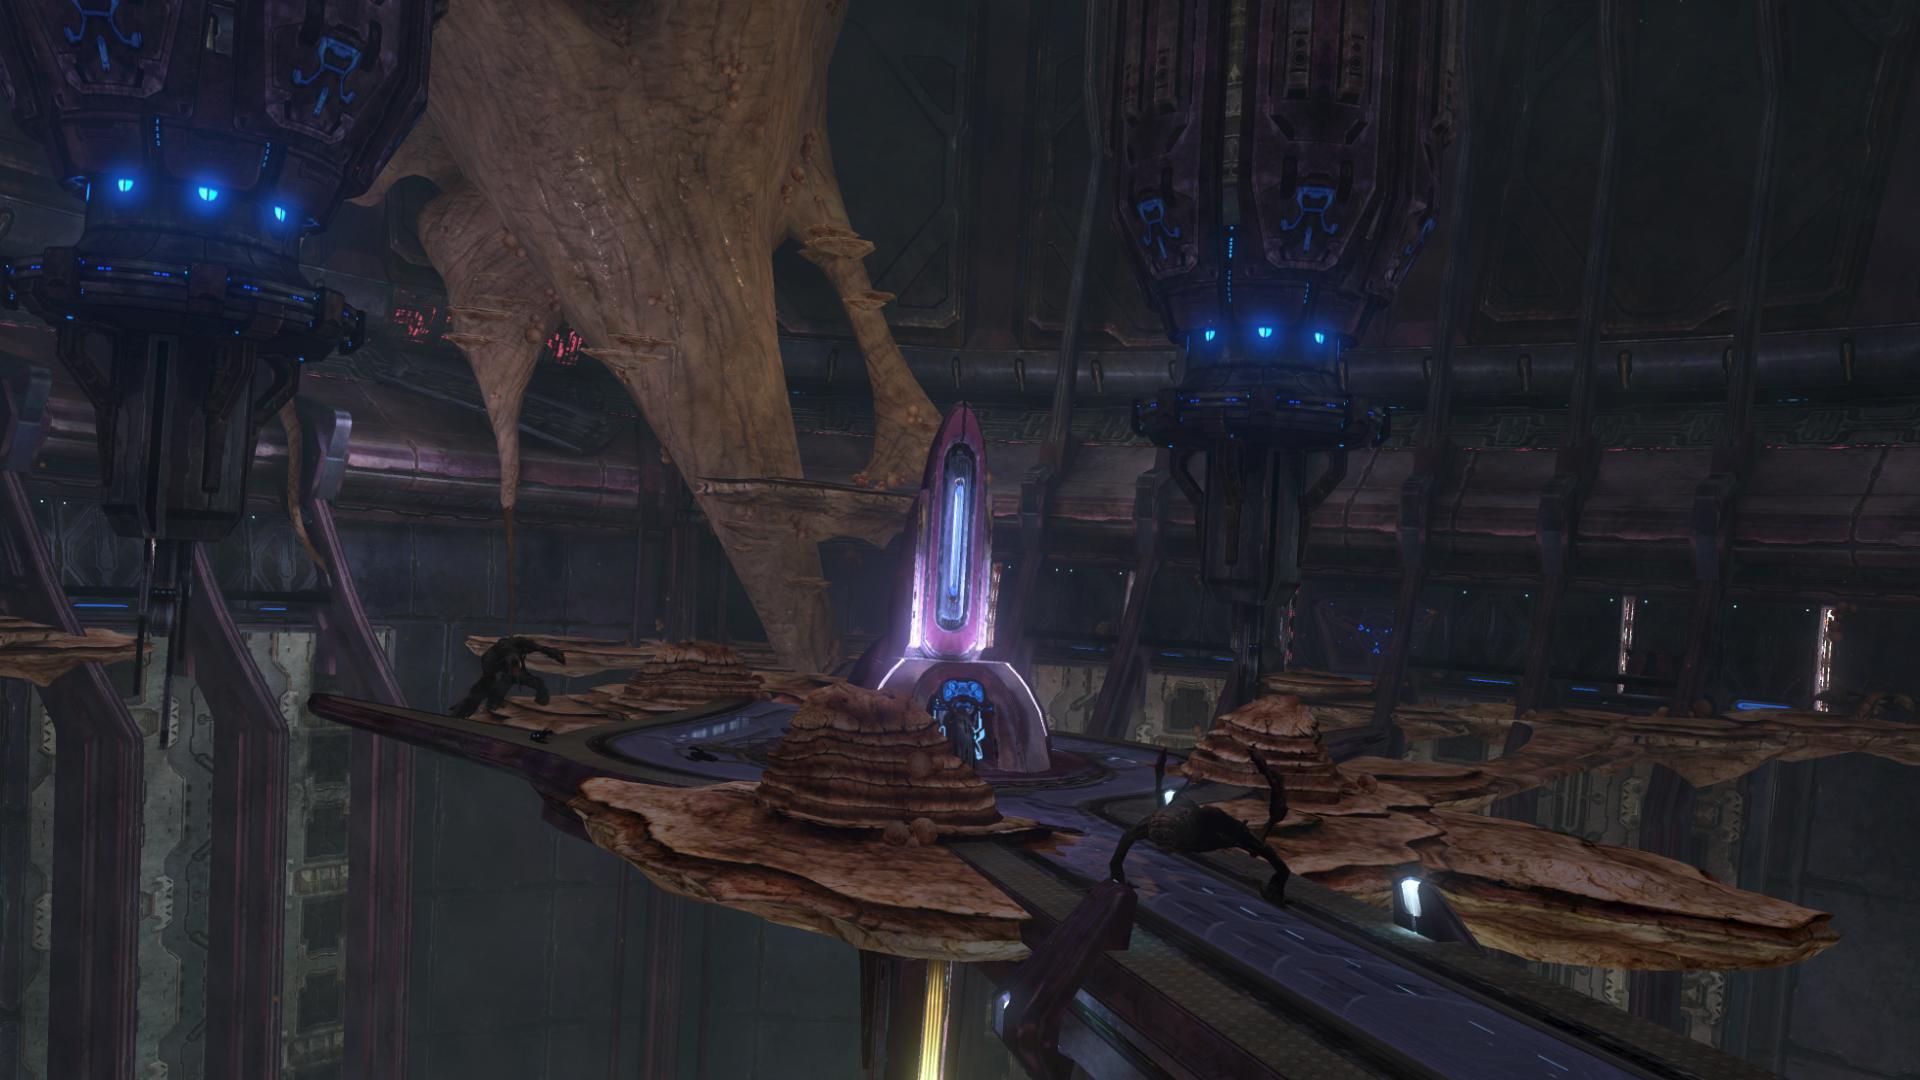 Halo 3 cortana level